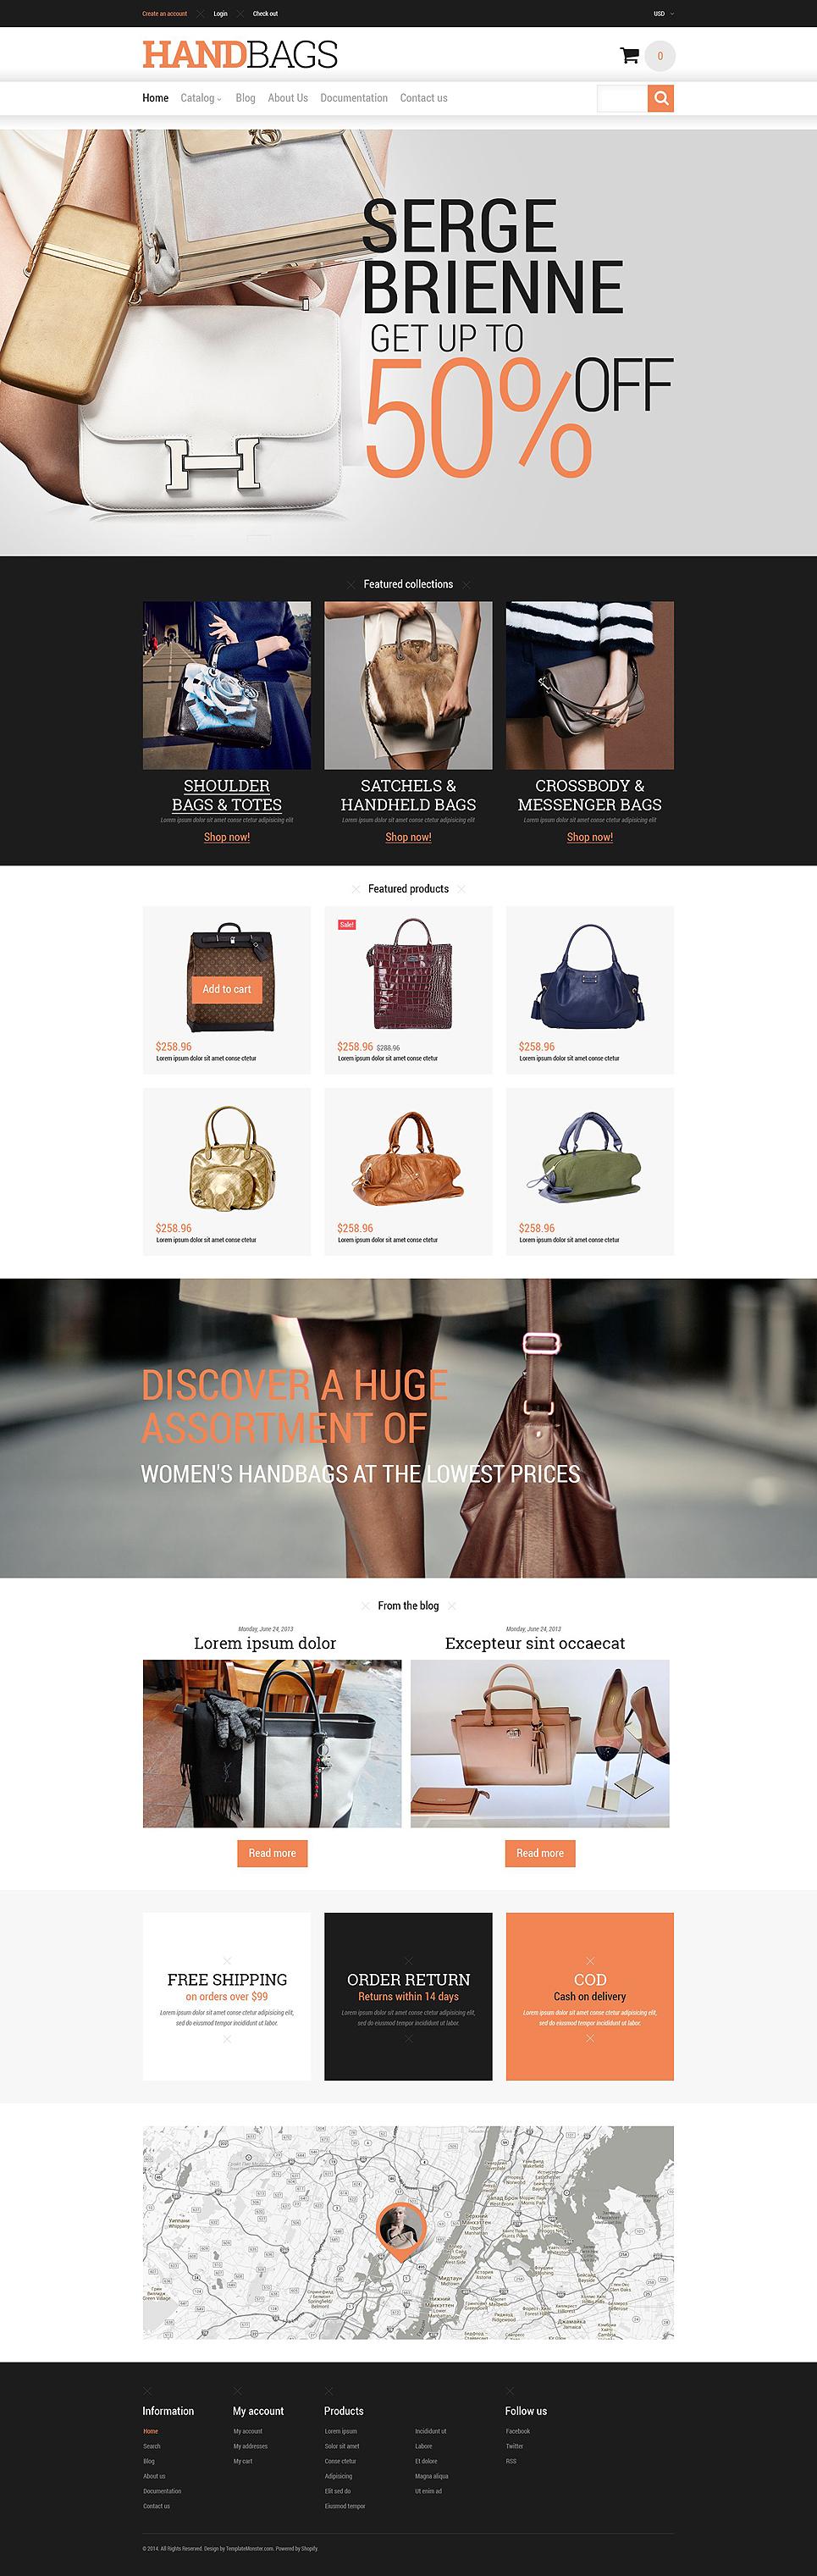 Branded handbags shopify theme 52332 branded handbags